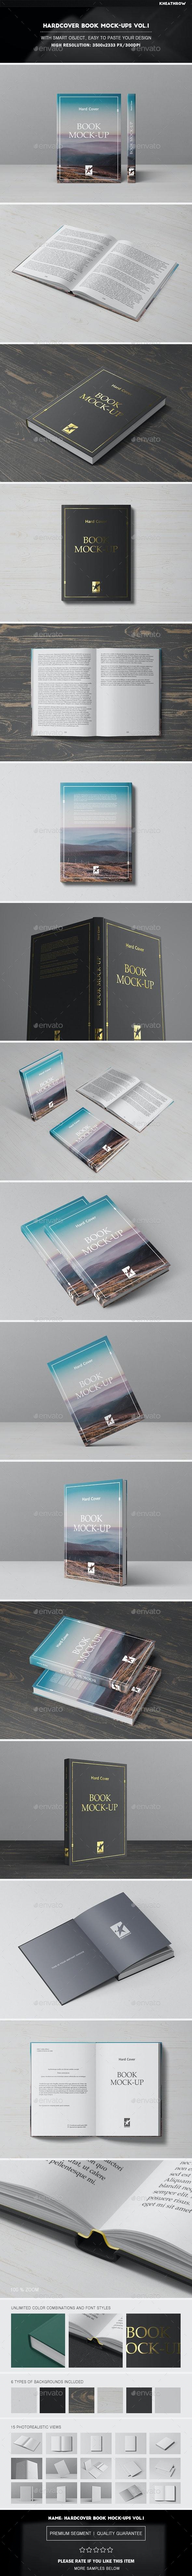 Hardcover Book Mock-Ups Vol.1 - Books Print